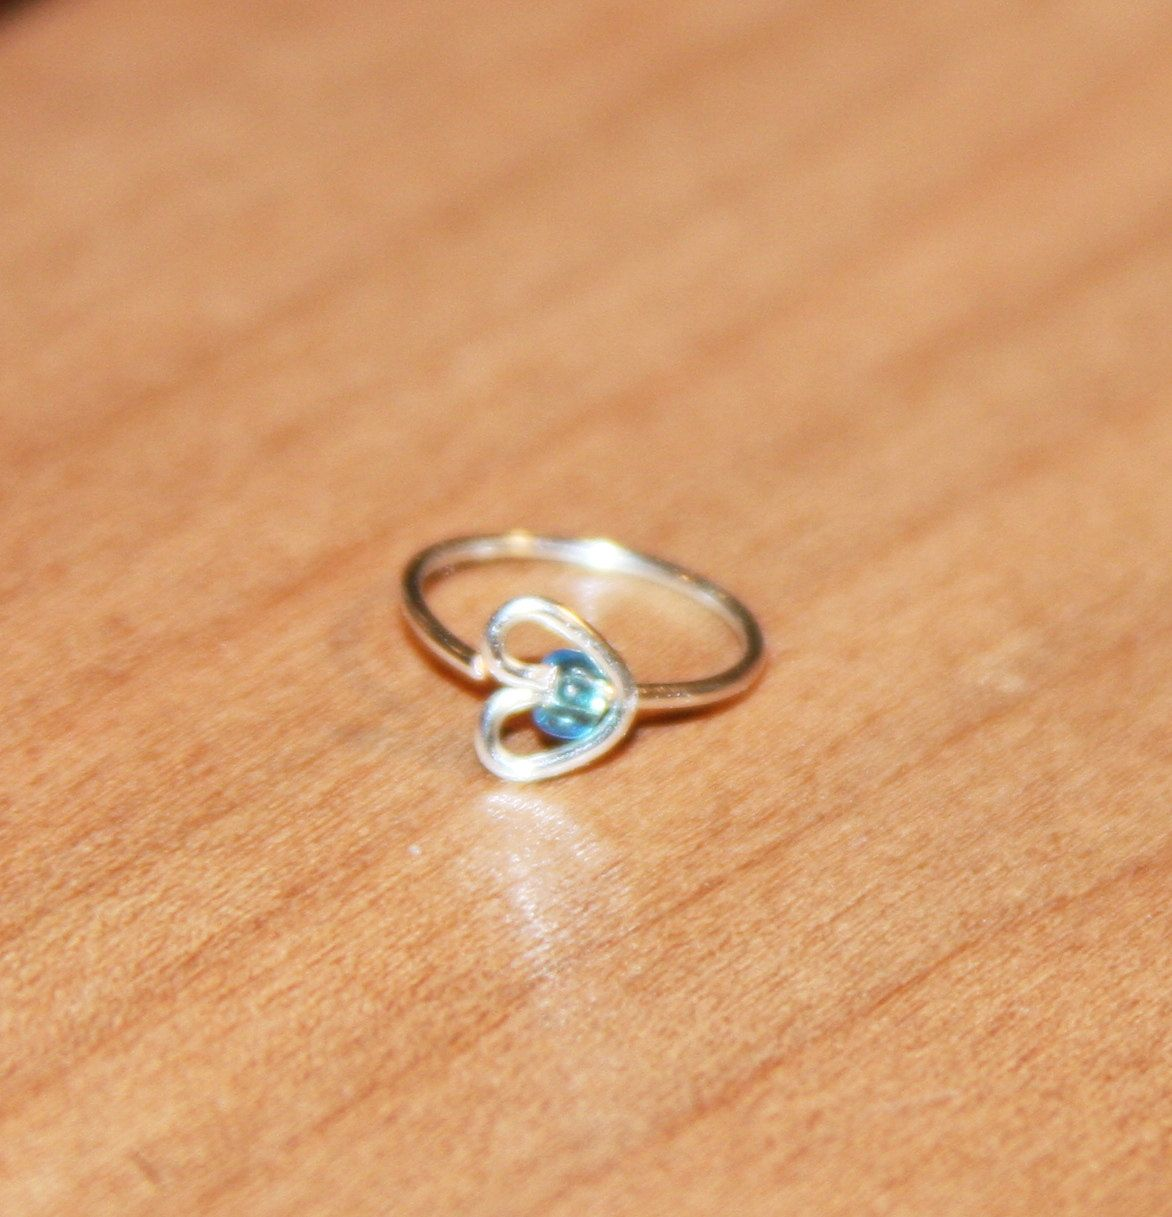 Small Heart Nose Ring Blue Beaded Heart Tragus Hoop Earring 20